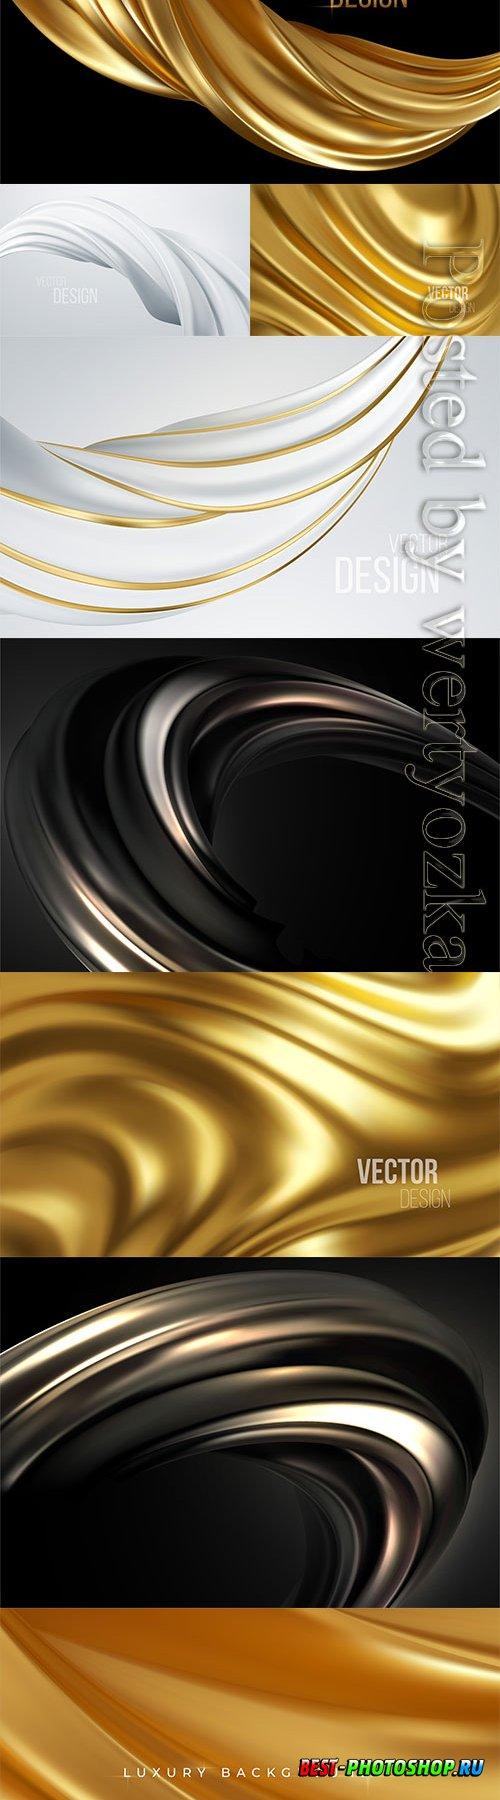 Gold metallic silk flowing wave luxury vector background